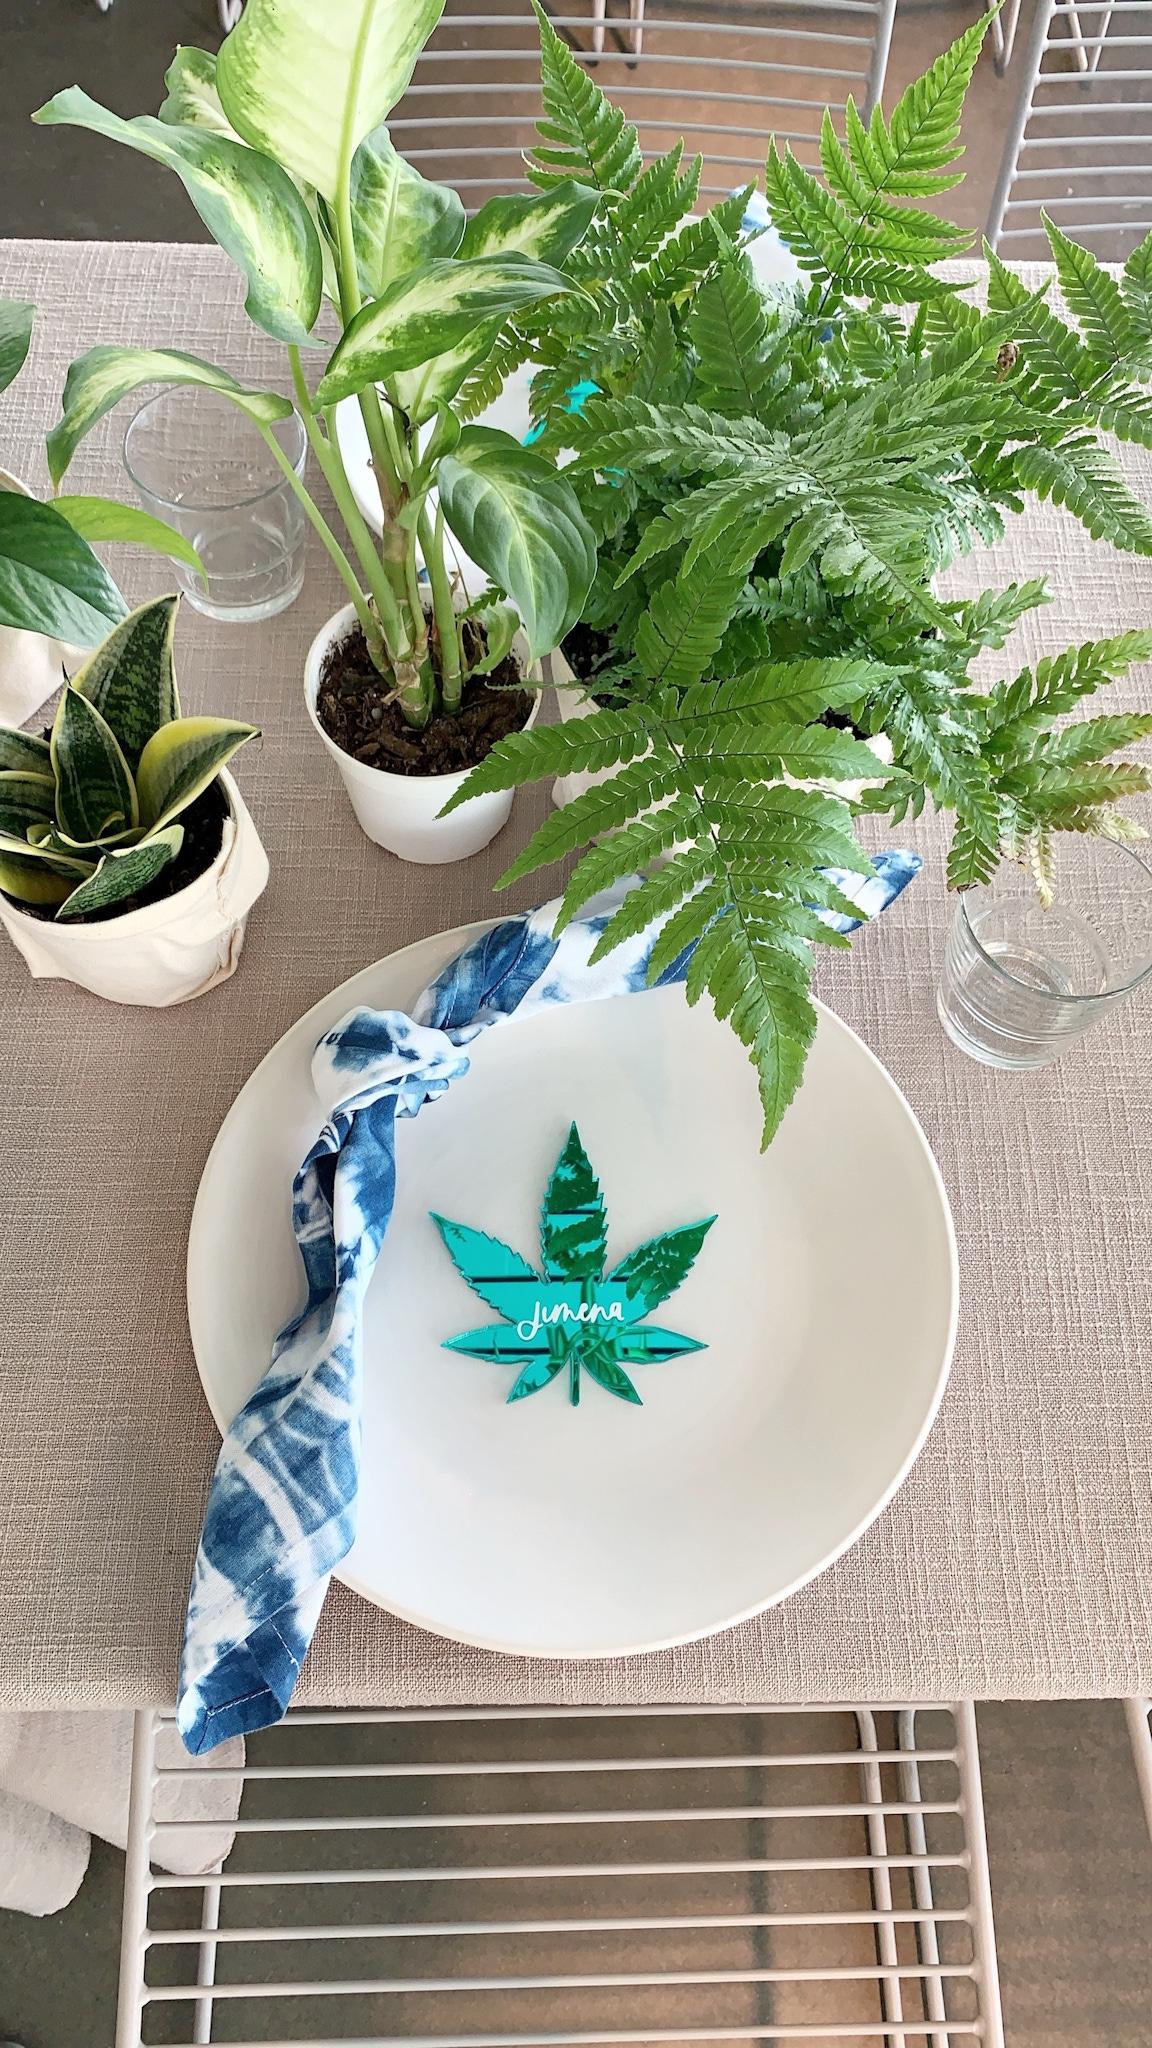 wildchild cannabis seed